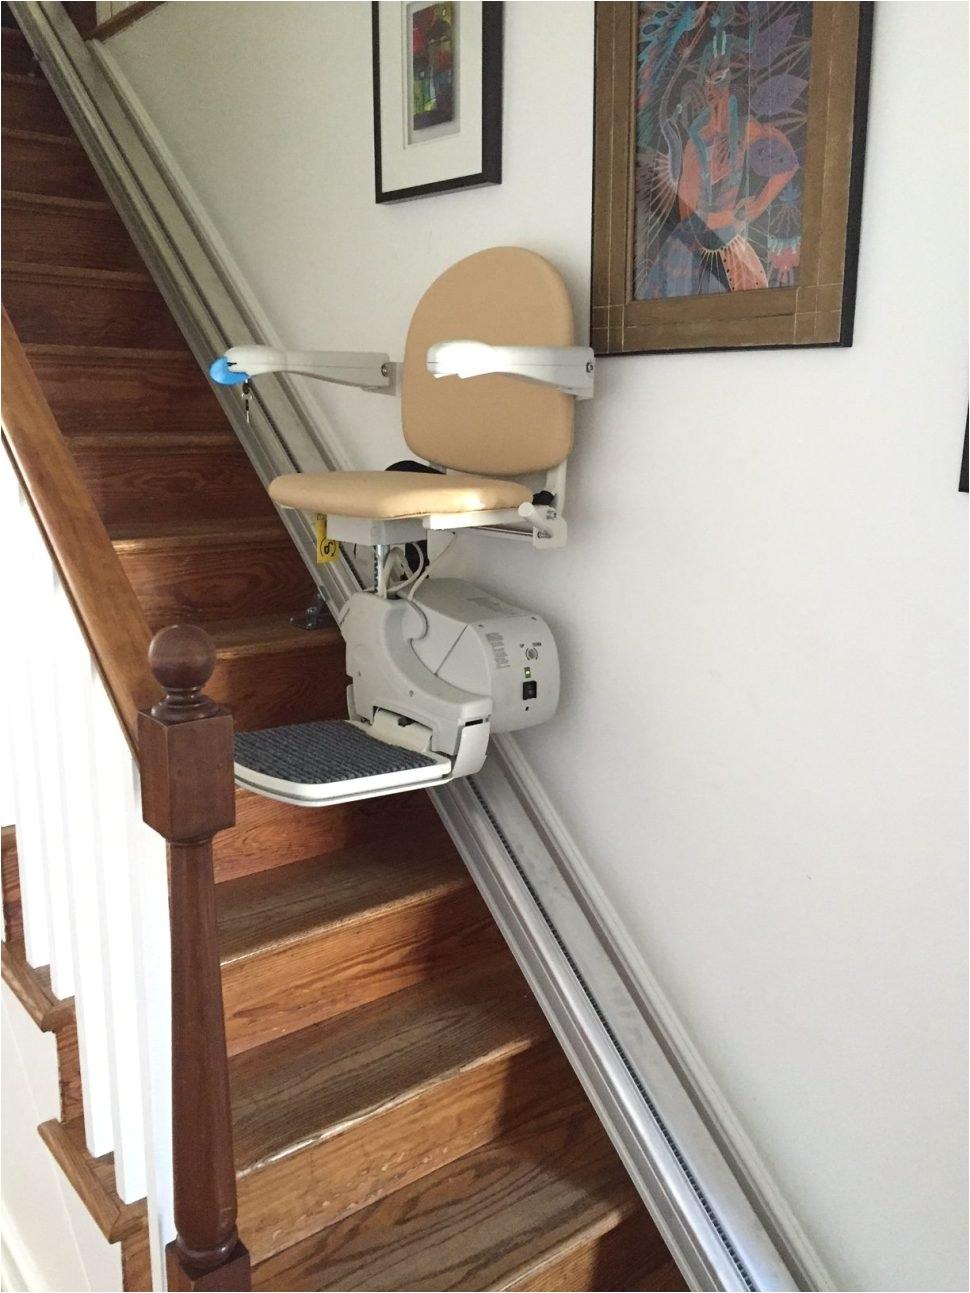 Ski Lift Chair for Sale Craigslist Ski Lift Chair for Sale Vermont Bridger Bowl Wisconsin Ebay Small